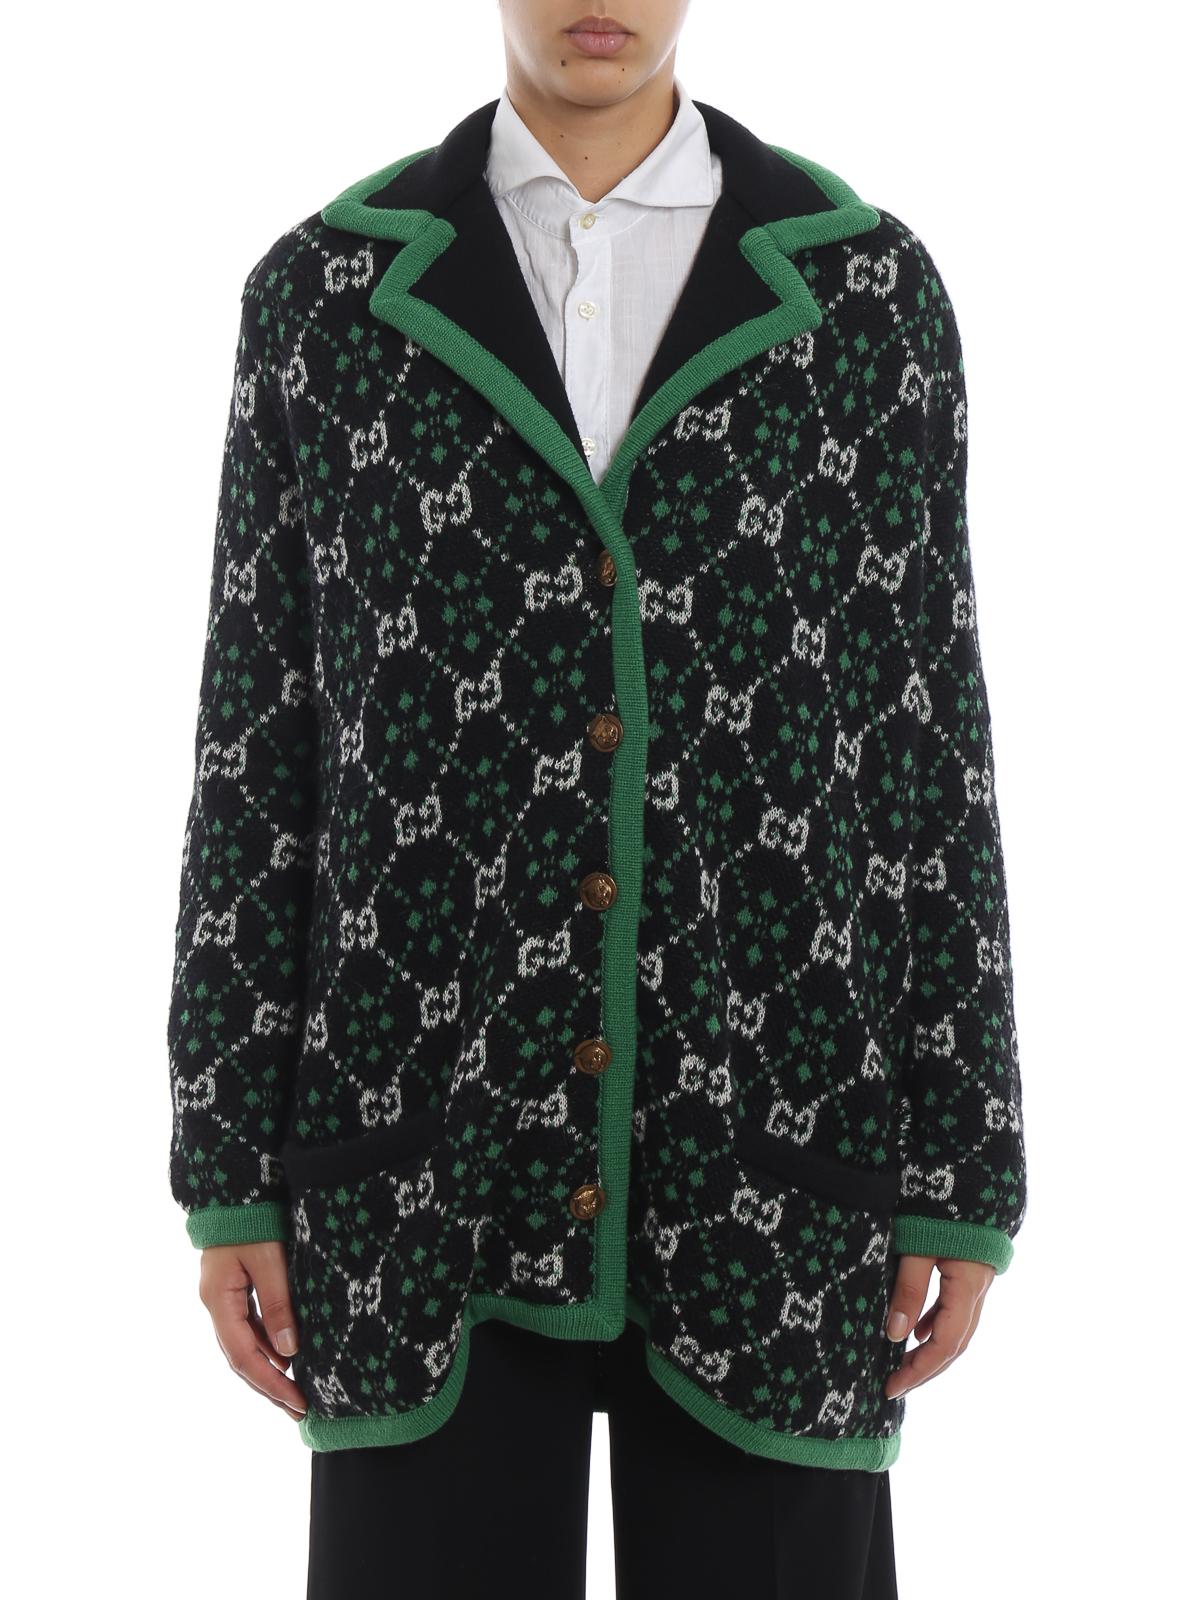 468f1ad7d68 iKRIX GUCCI: cardigans - GG pattern alpaca and wool over cardigan